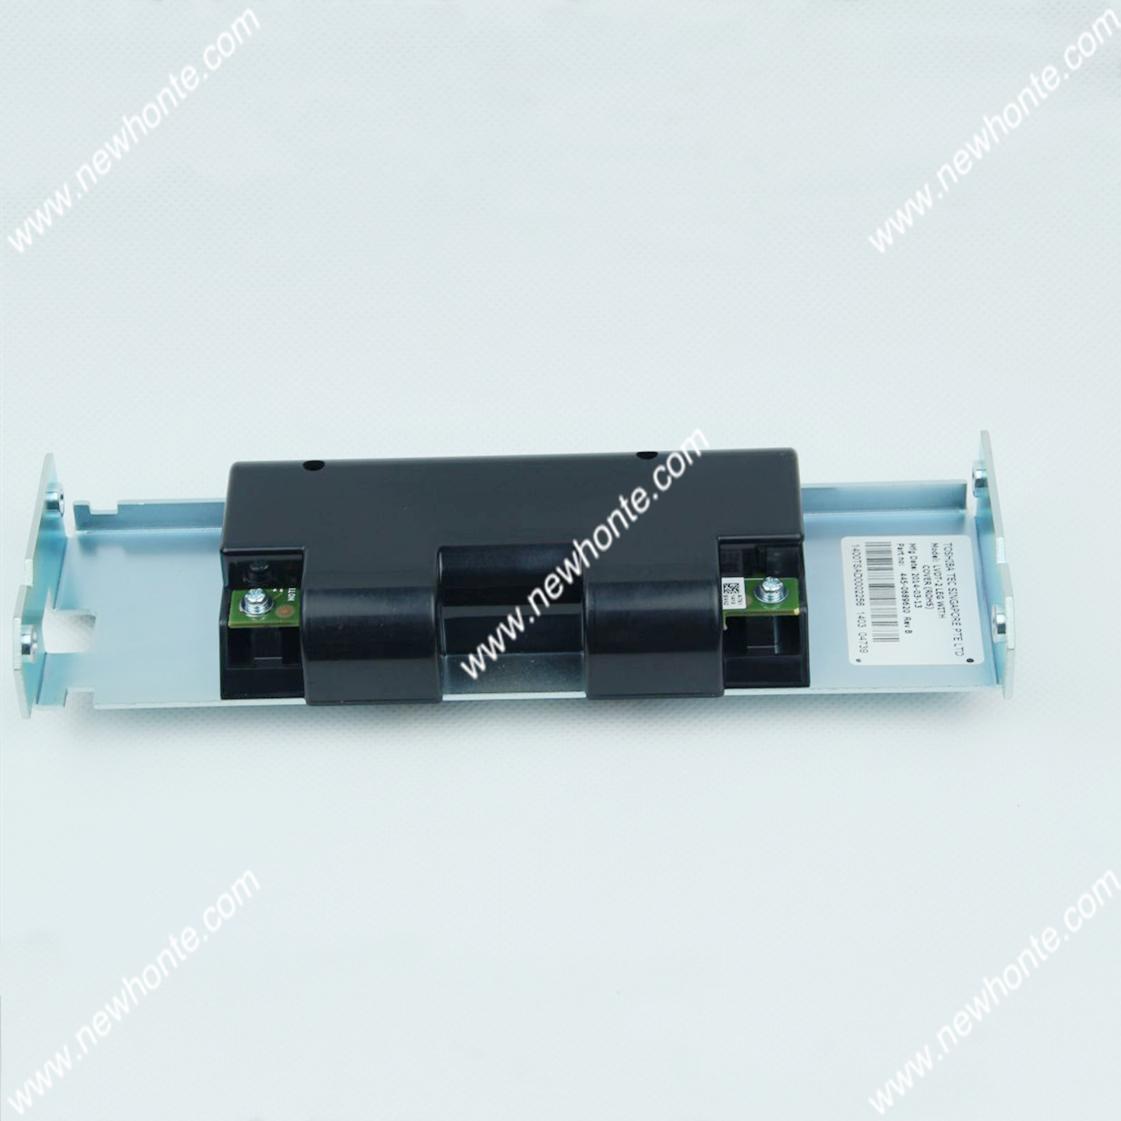 ATM NCR58XX sensor assy 4450689620 LVDT-2 Leg with cover ROHS 445-0689620